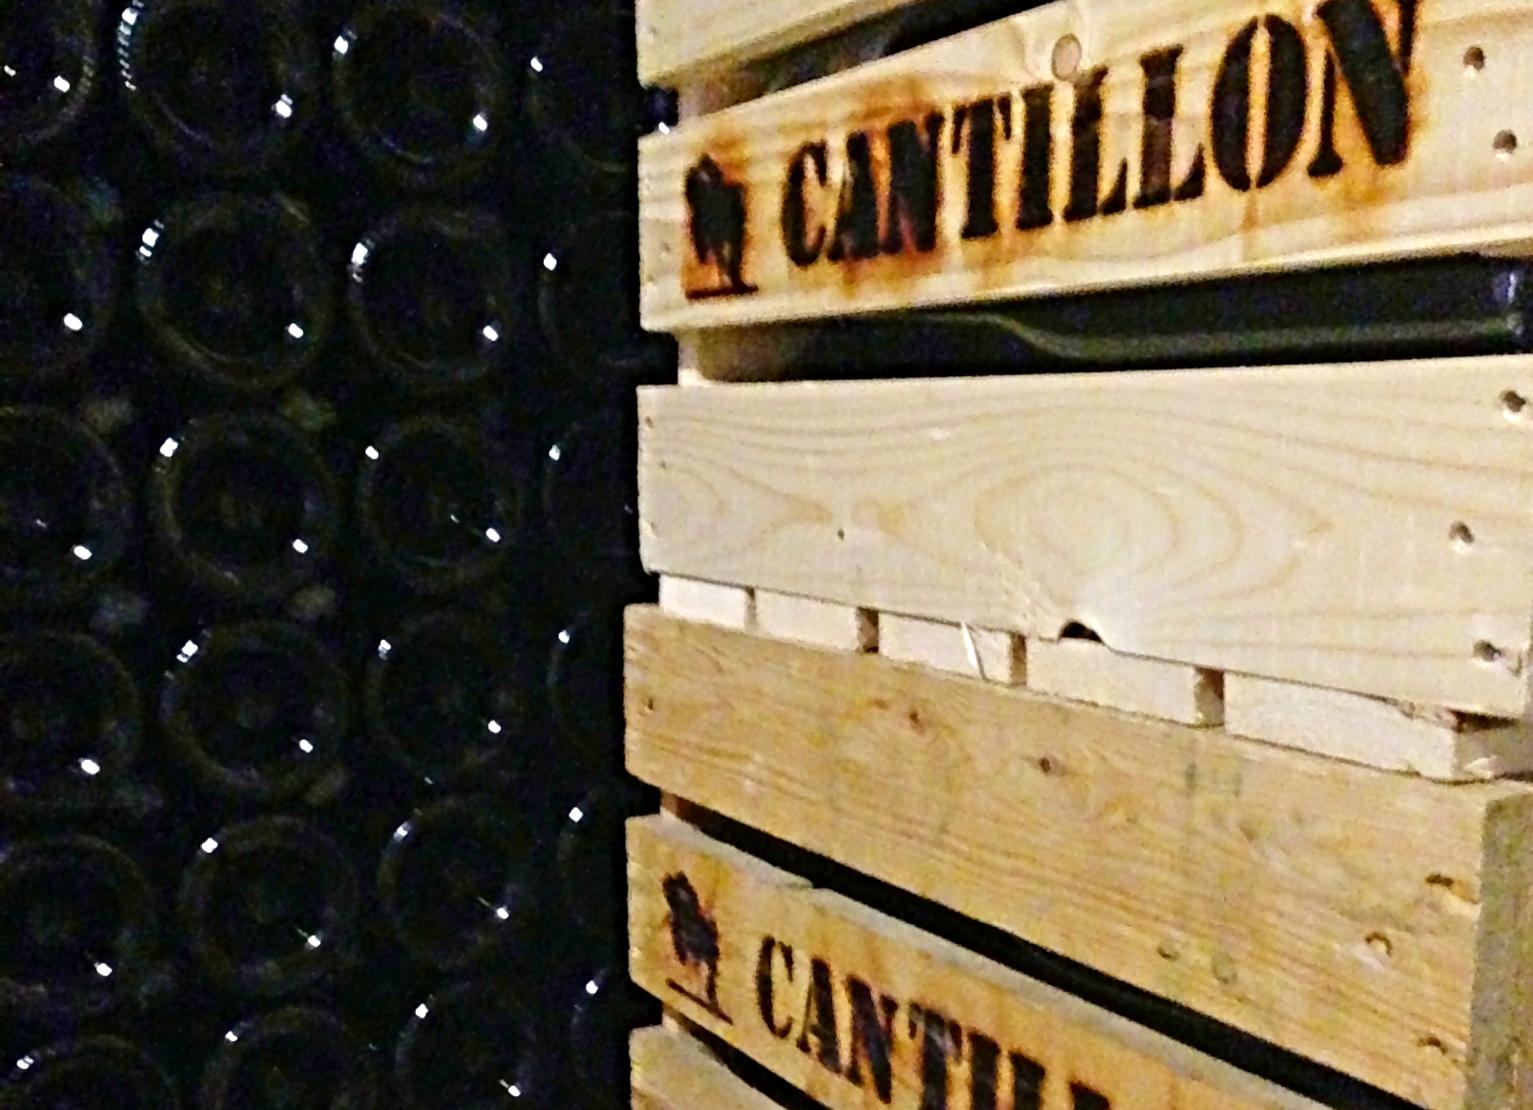 Cantillon-lambic